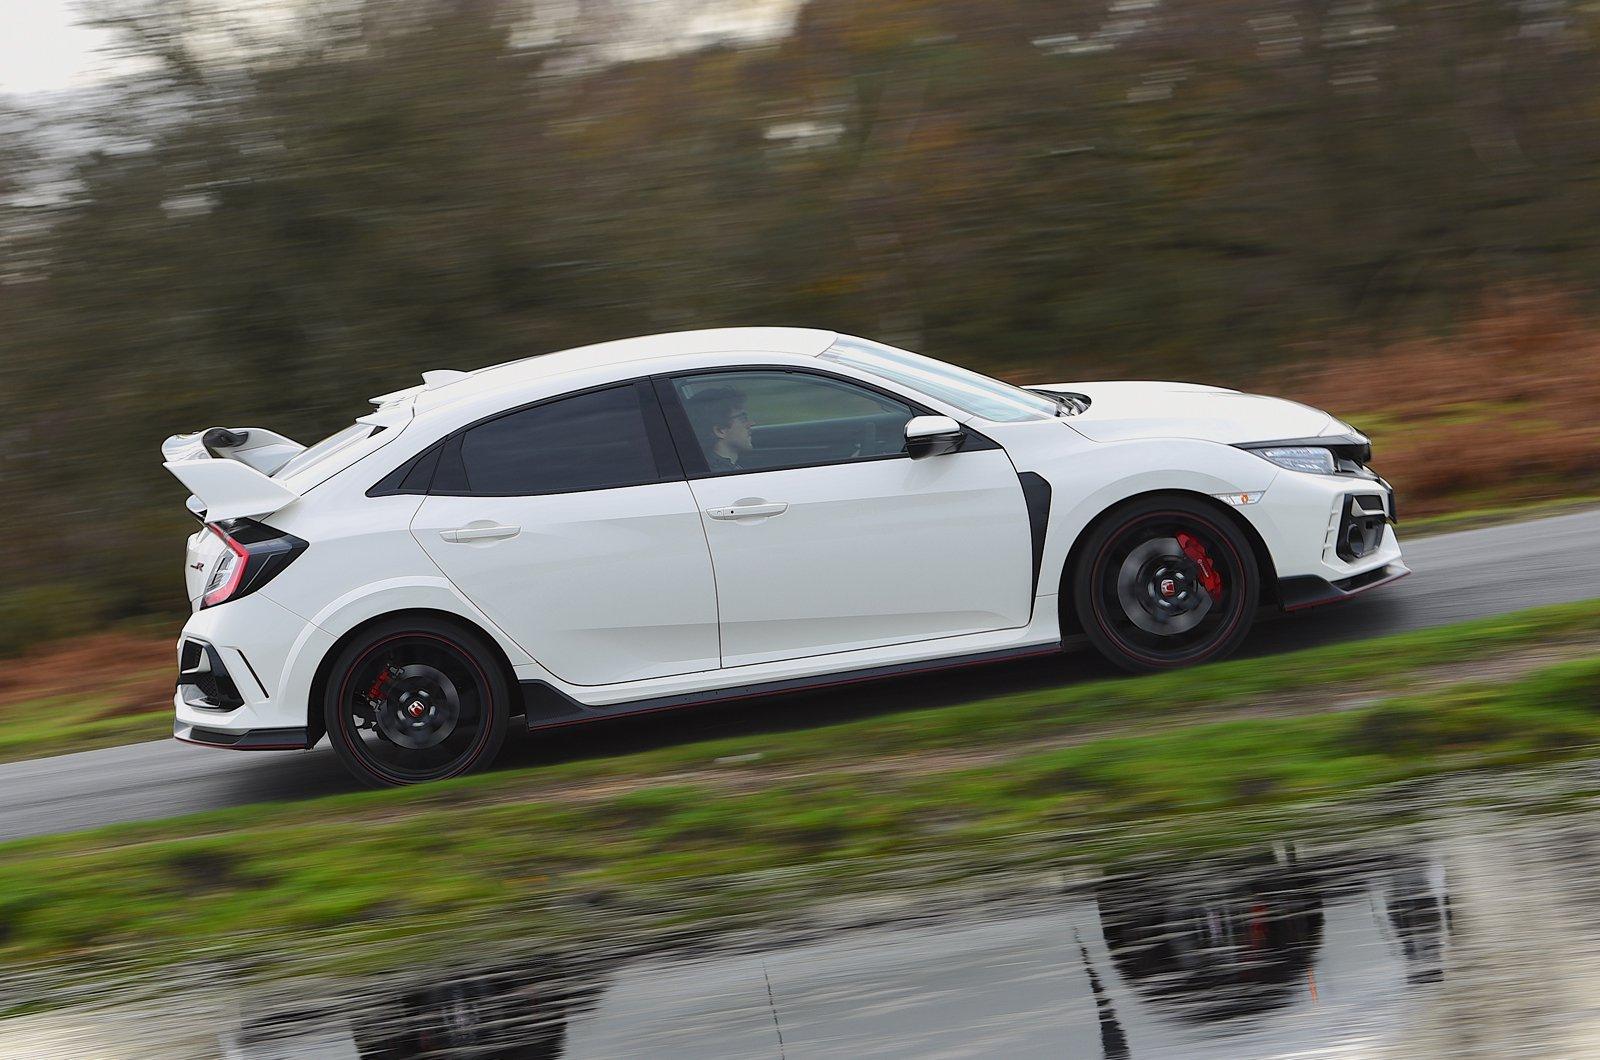 Honda Civic Type R 2021 side